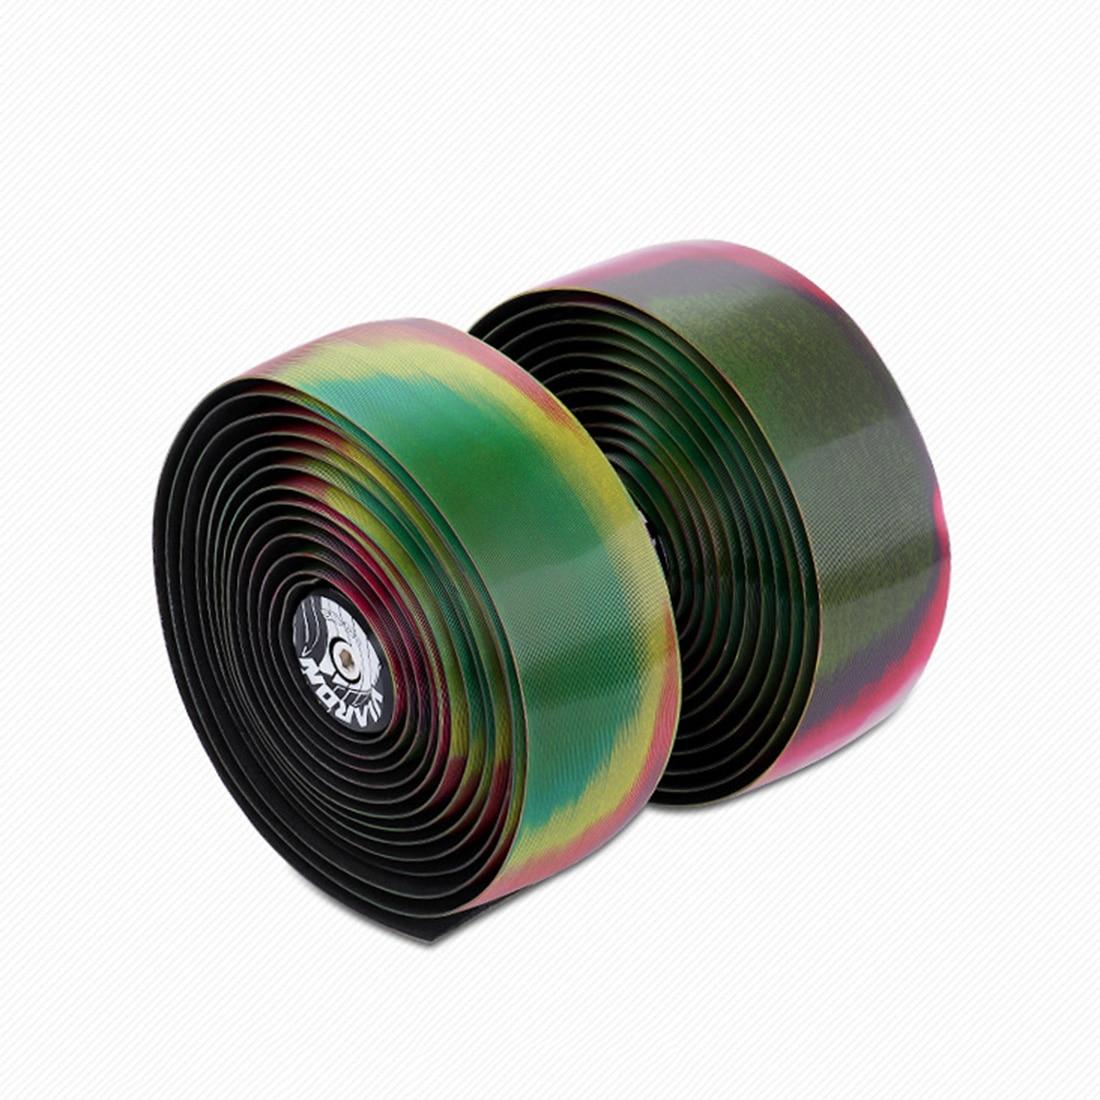 BOLAN Handlebar Bicycle 5D Rainbow Bar Tape Shock Absorption Practical